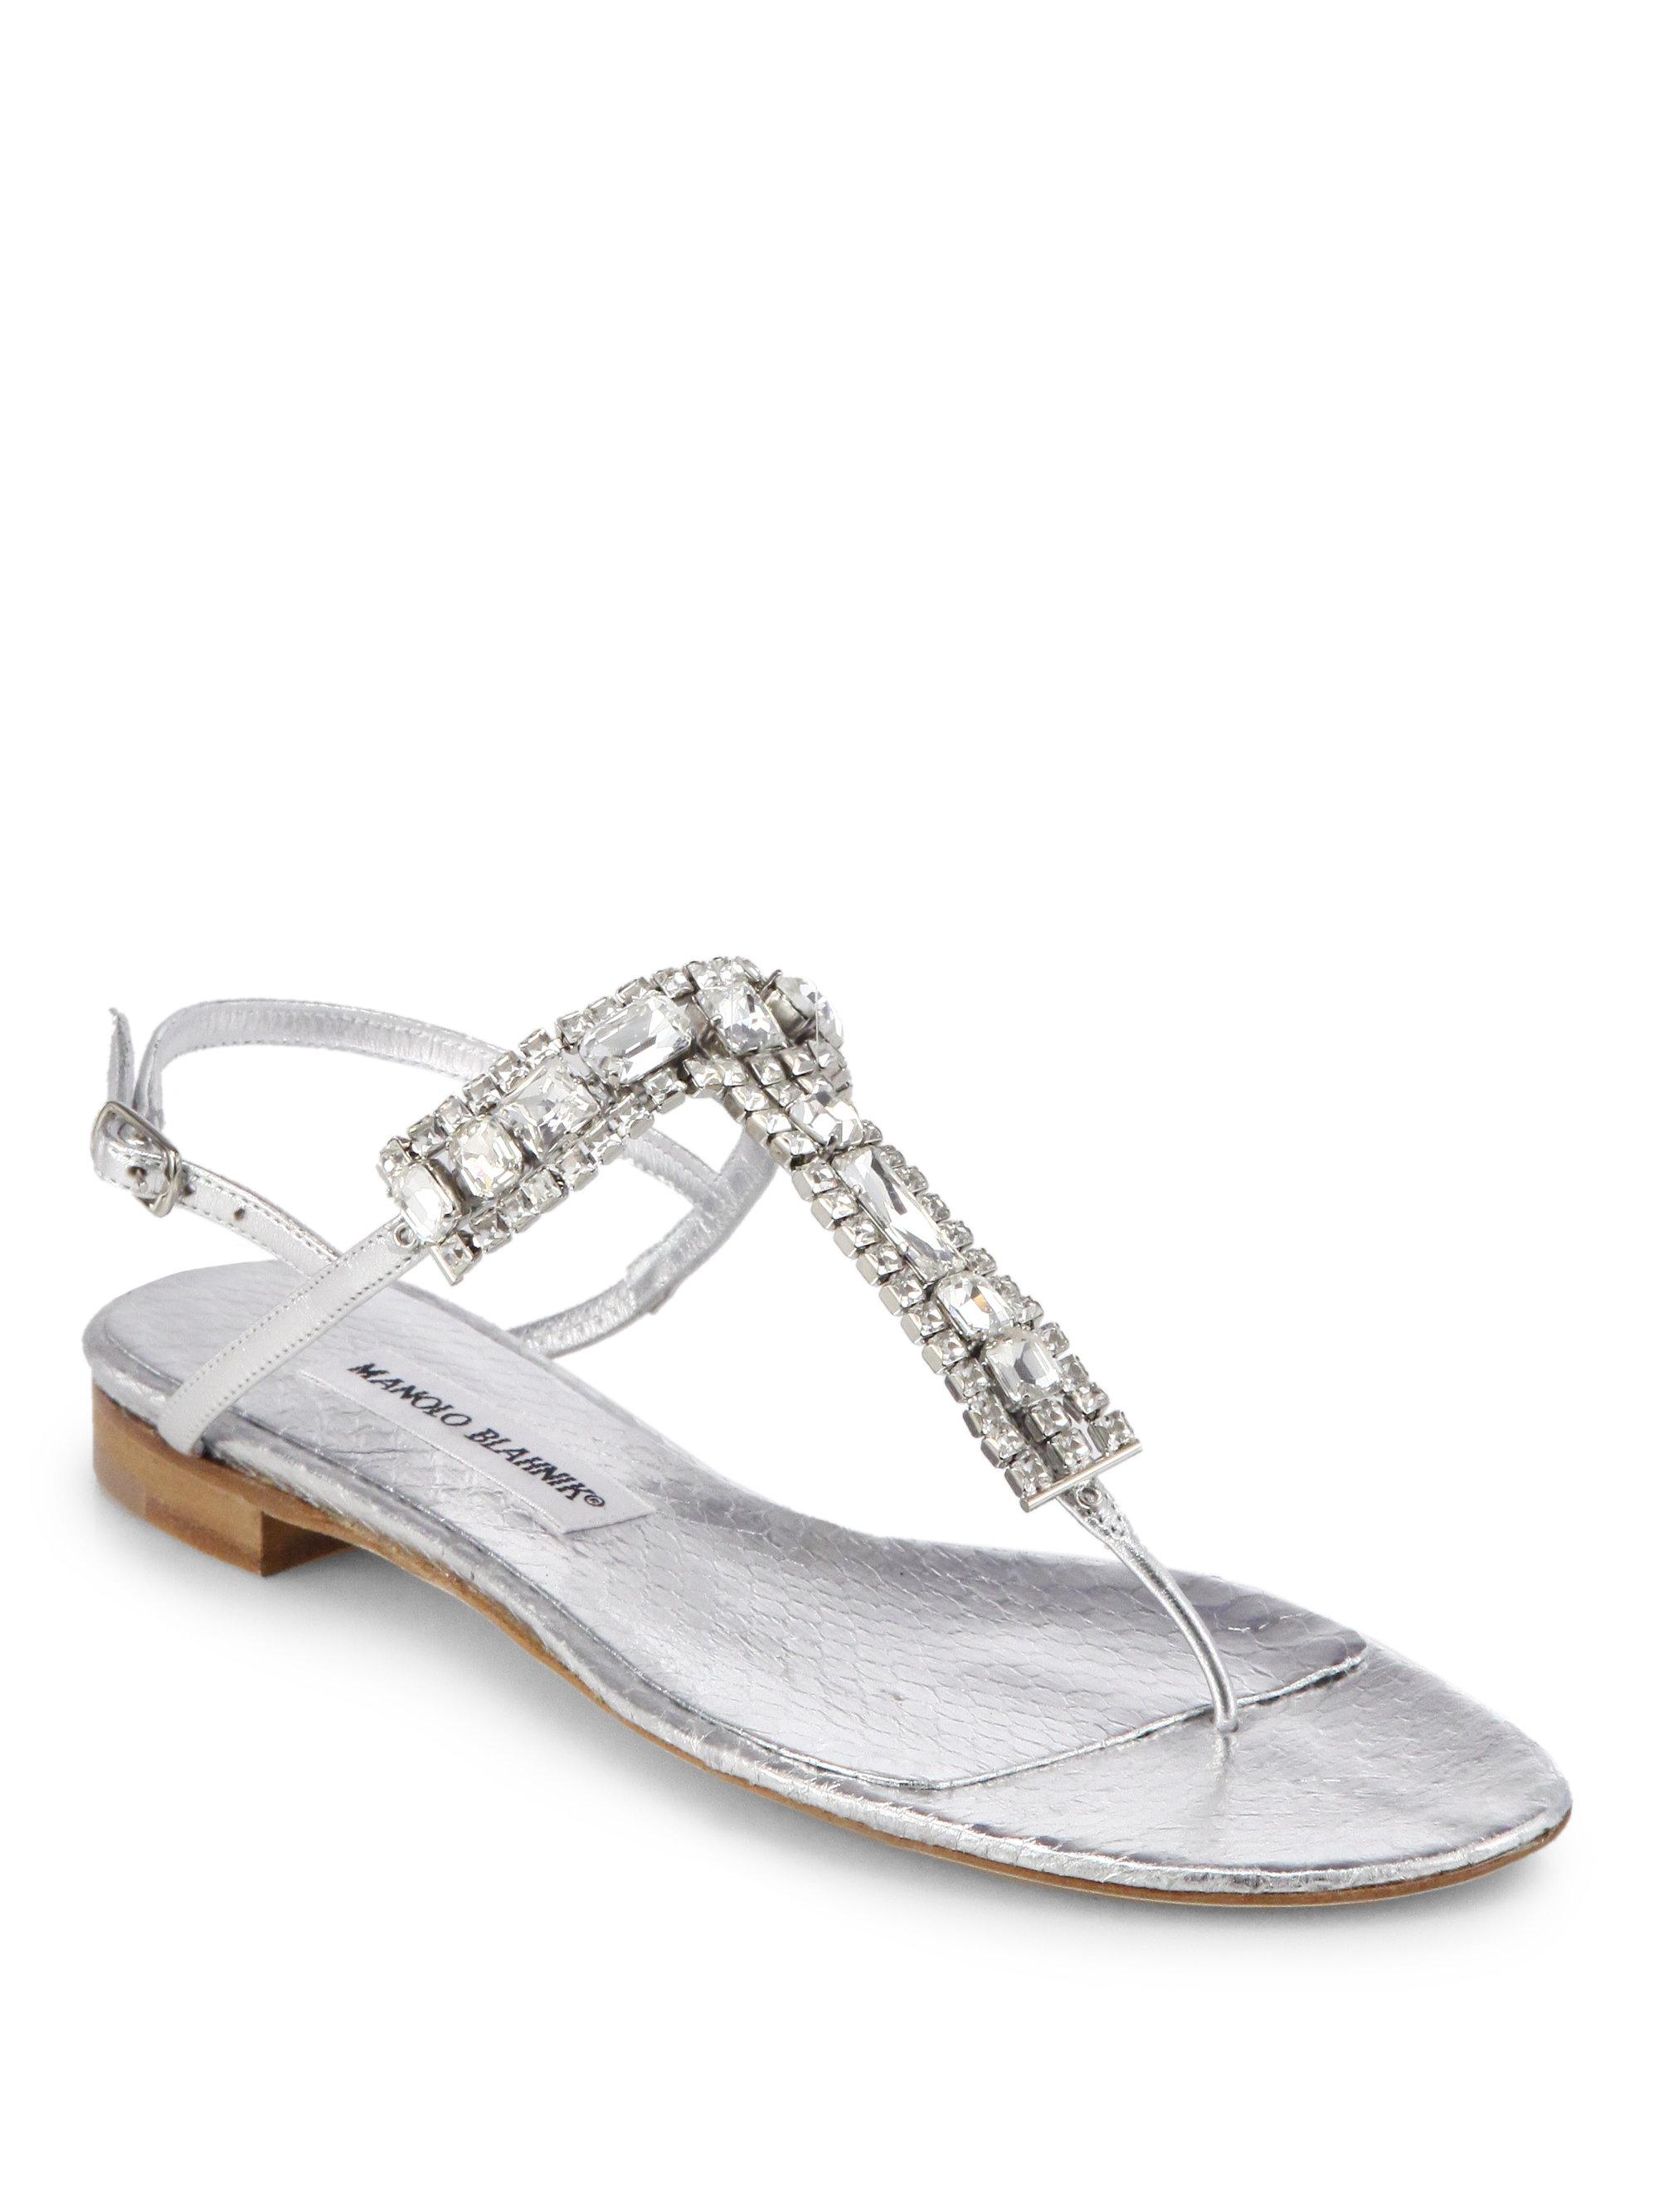 b2c48efc01c32 Lyst - Manolo Blahnik Zanfimod Jeweled Metallic Leather Thong ...